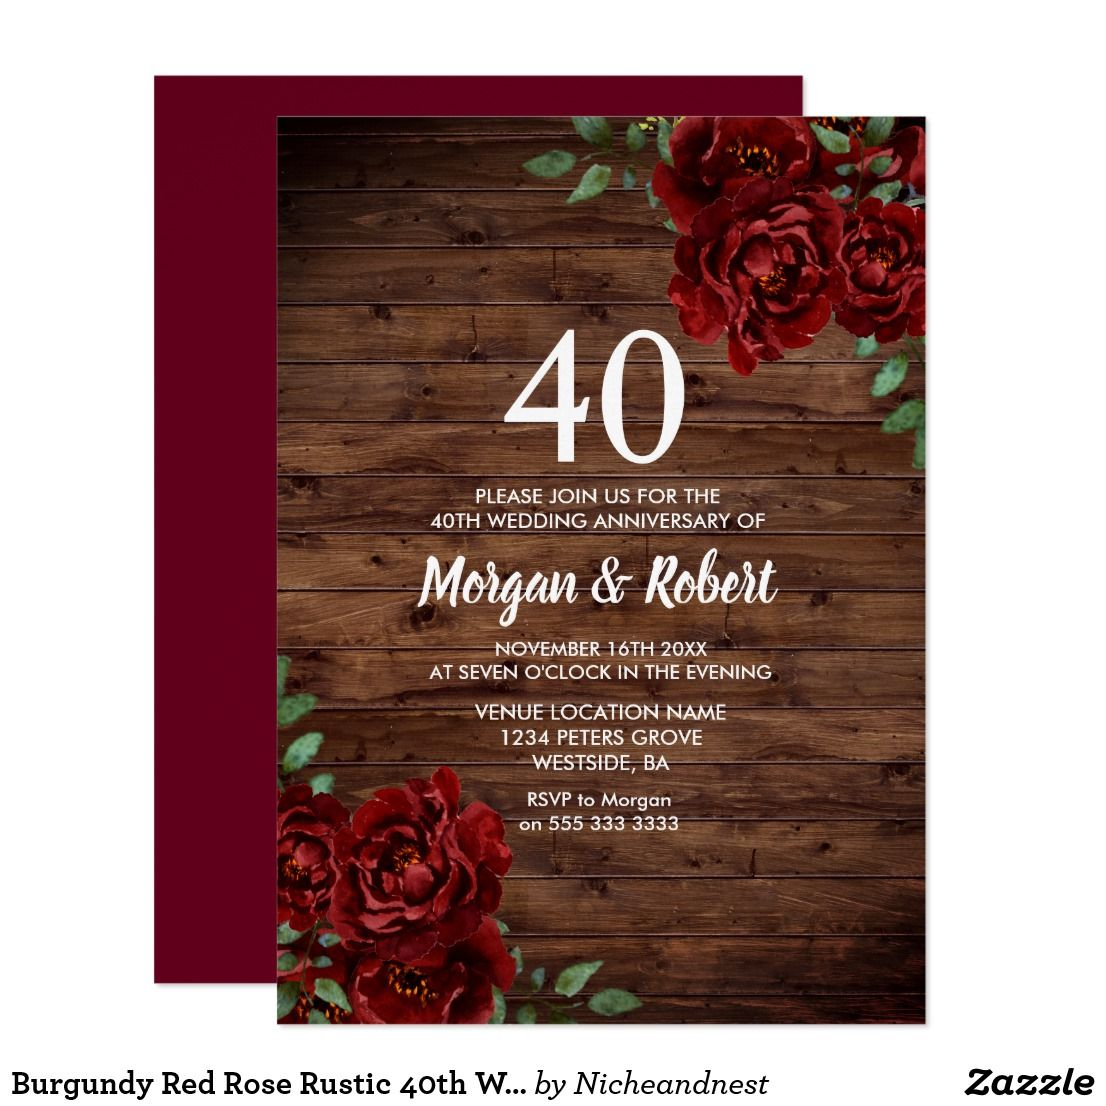 Burgundy Red Rose Rustic 40th Wedding Anniversary Invitation ...